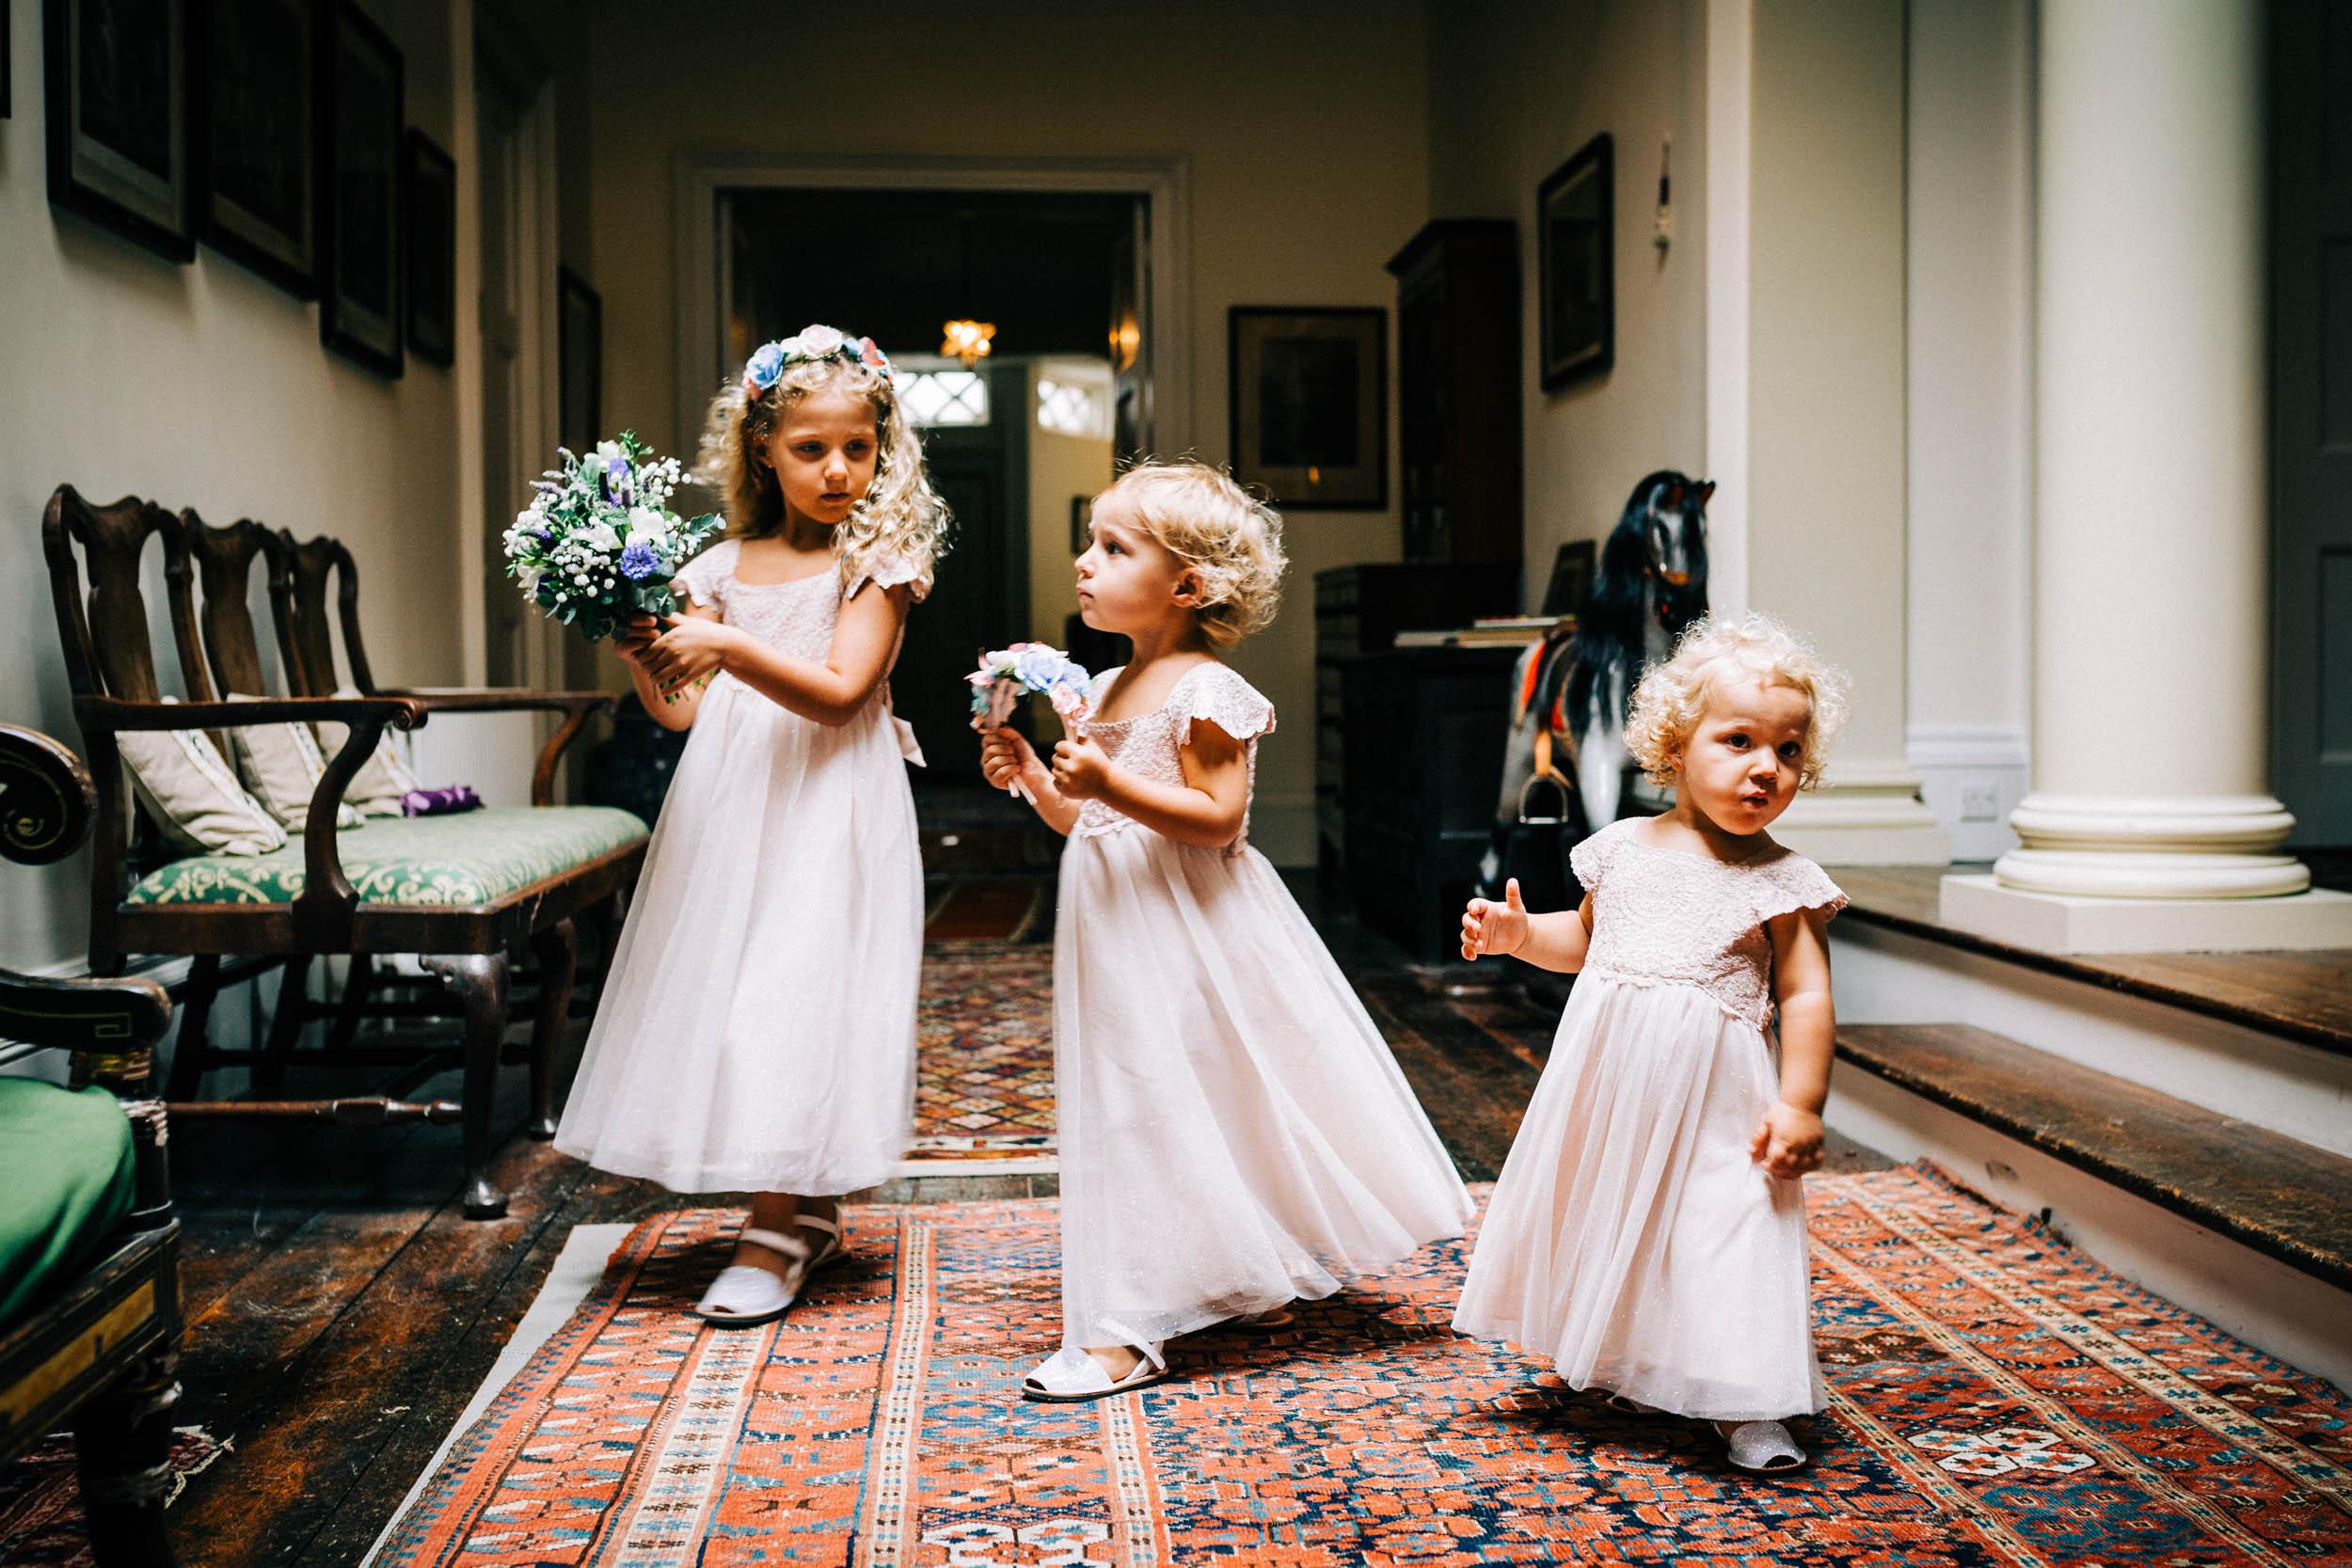 Alex_Sedgmond_Photography-SouthWalesWeddingPhotography-Wedding-Photographer-Cardiff.jpg